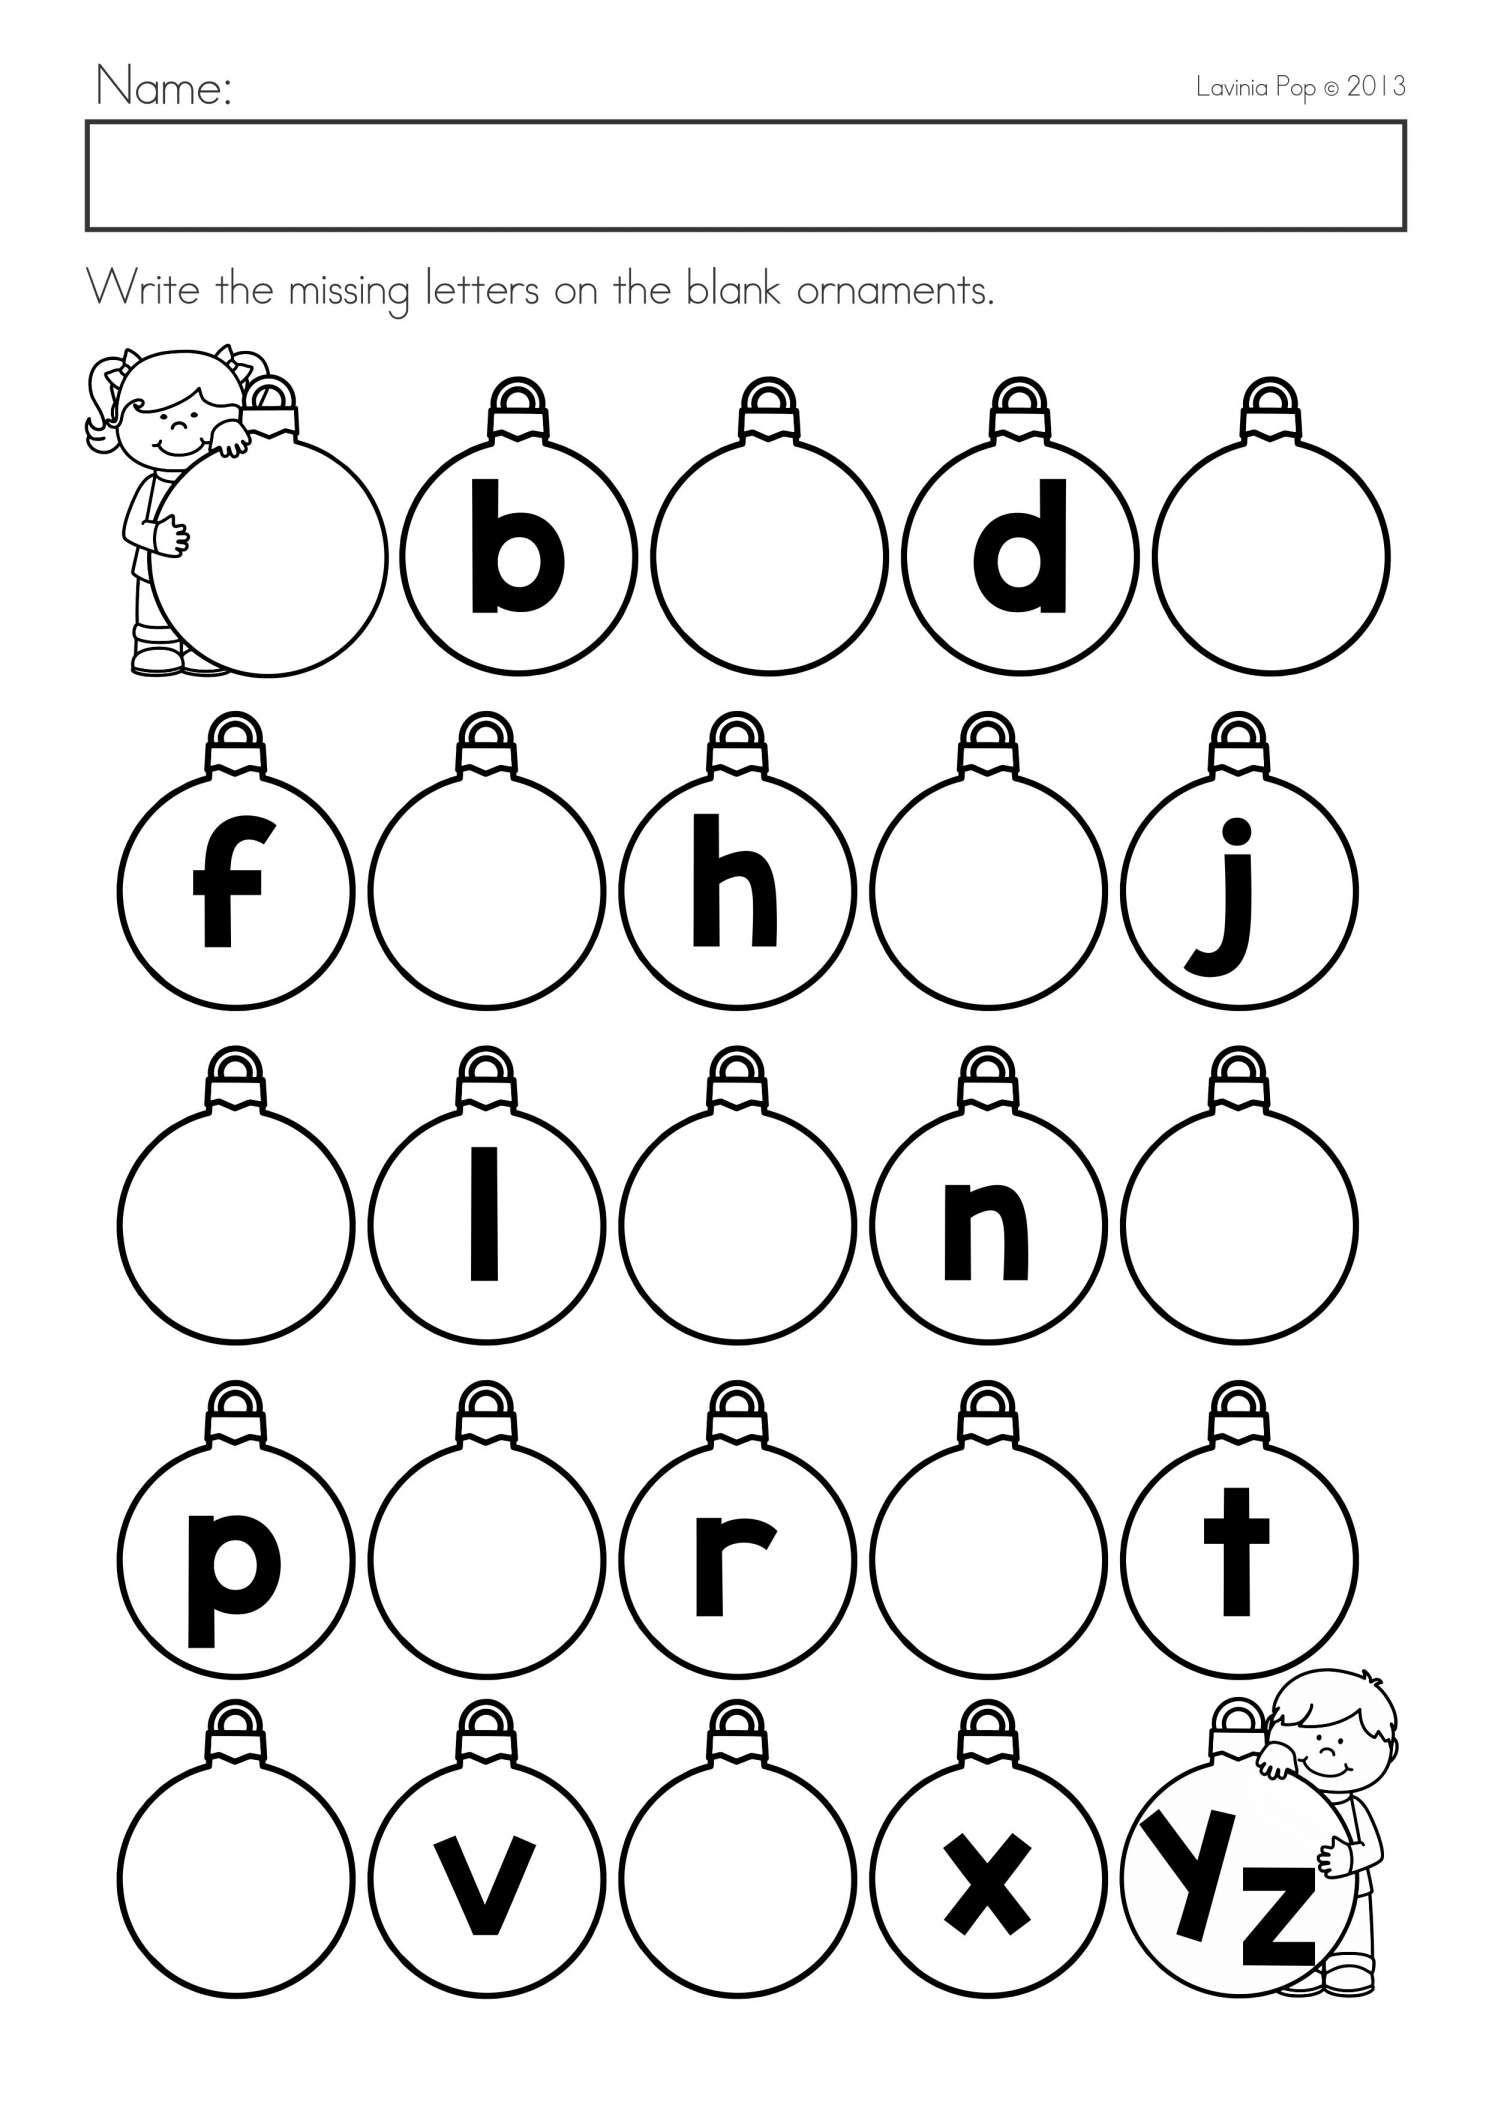 10 Letter Sequence Worksheet Kindergarten Kindergarten Printable Sheets Com Christmas Math Worksheets Literacy Worksheets Christmas Math